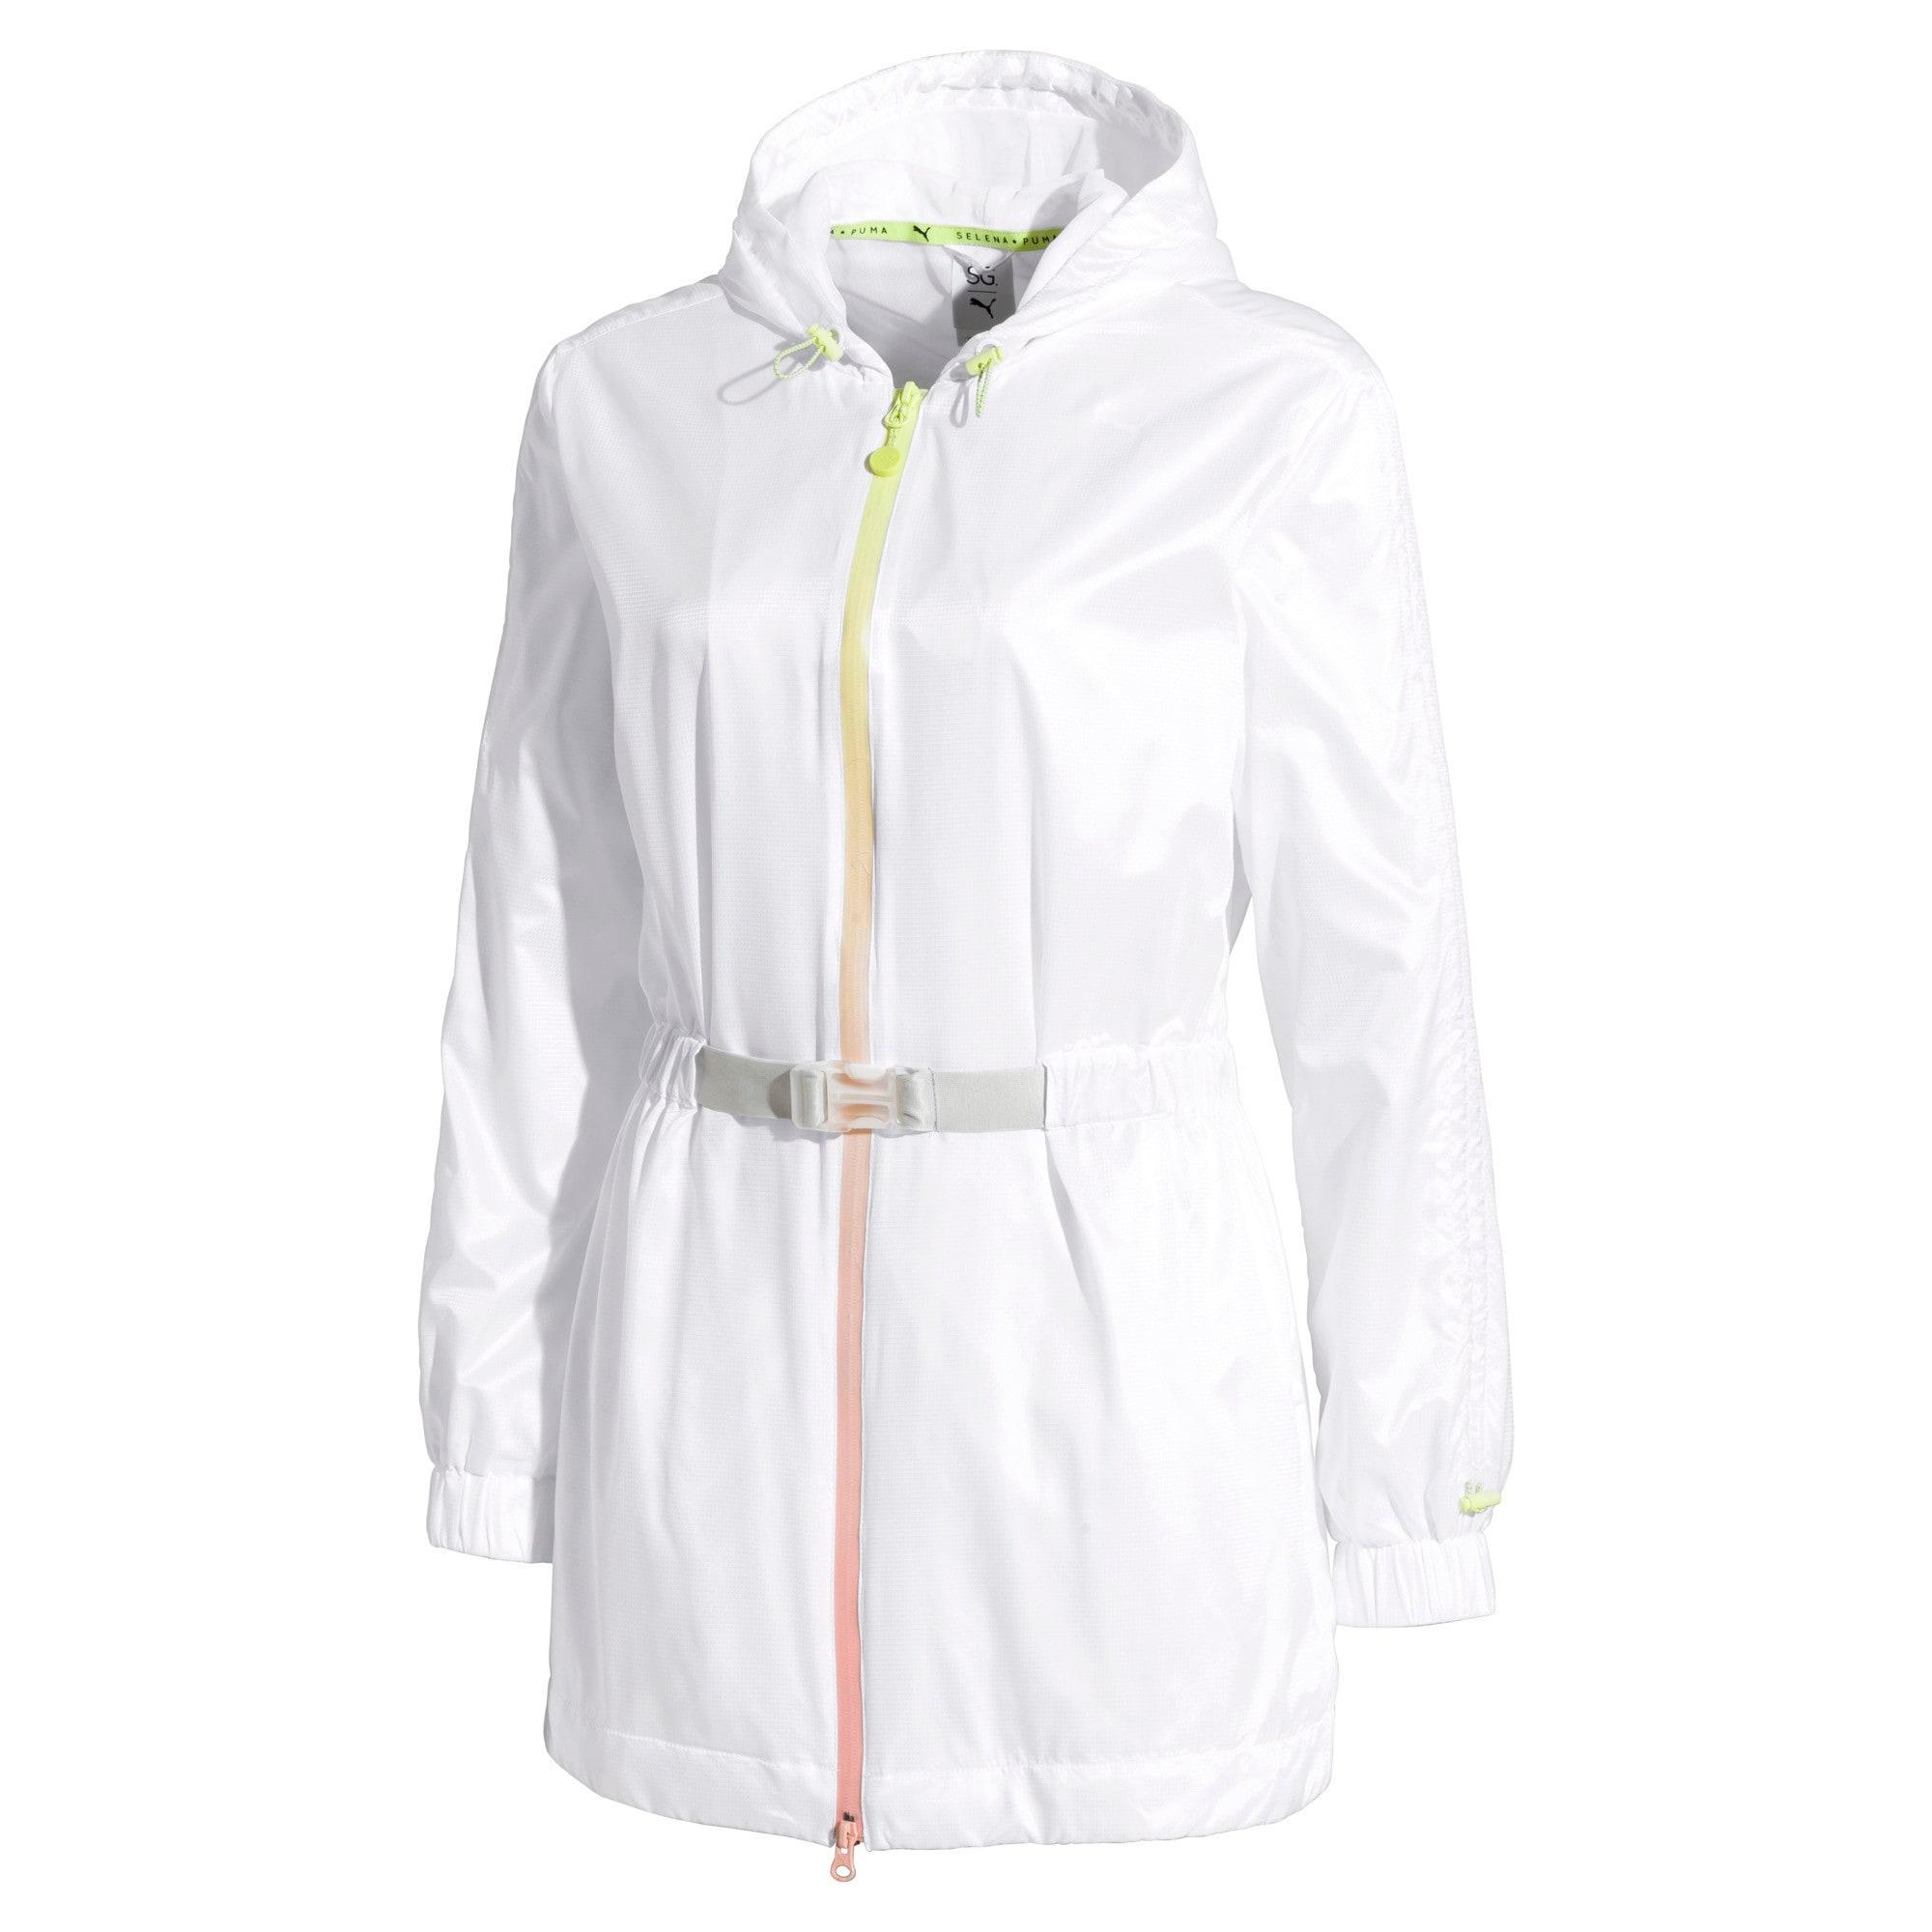 Thumbnail 4 of SG x PUMA Jacket, Puma White, medium